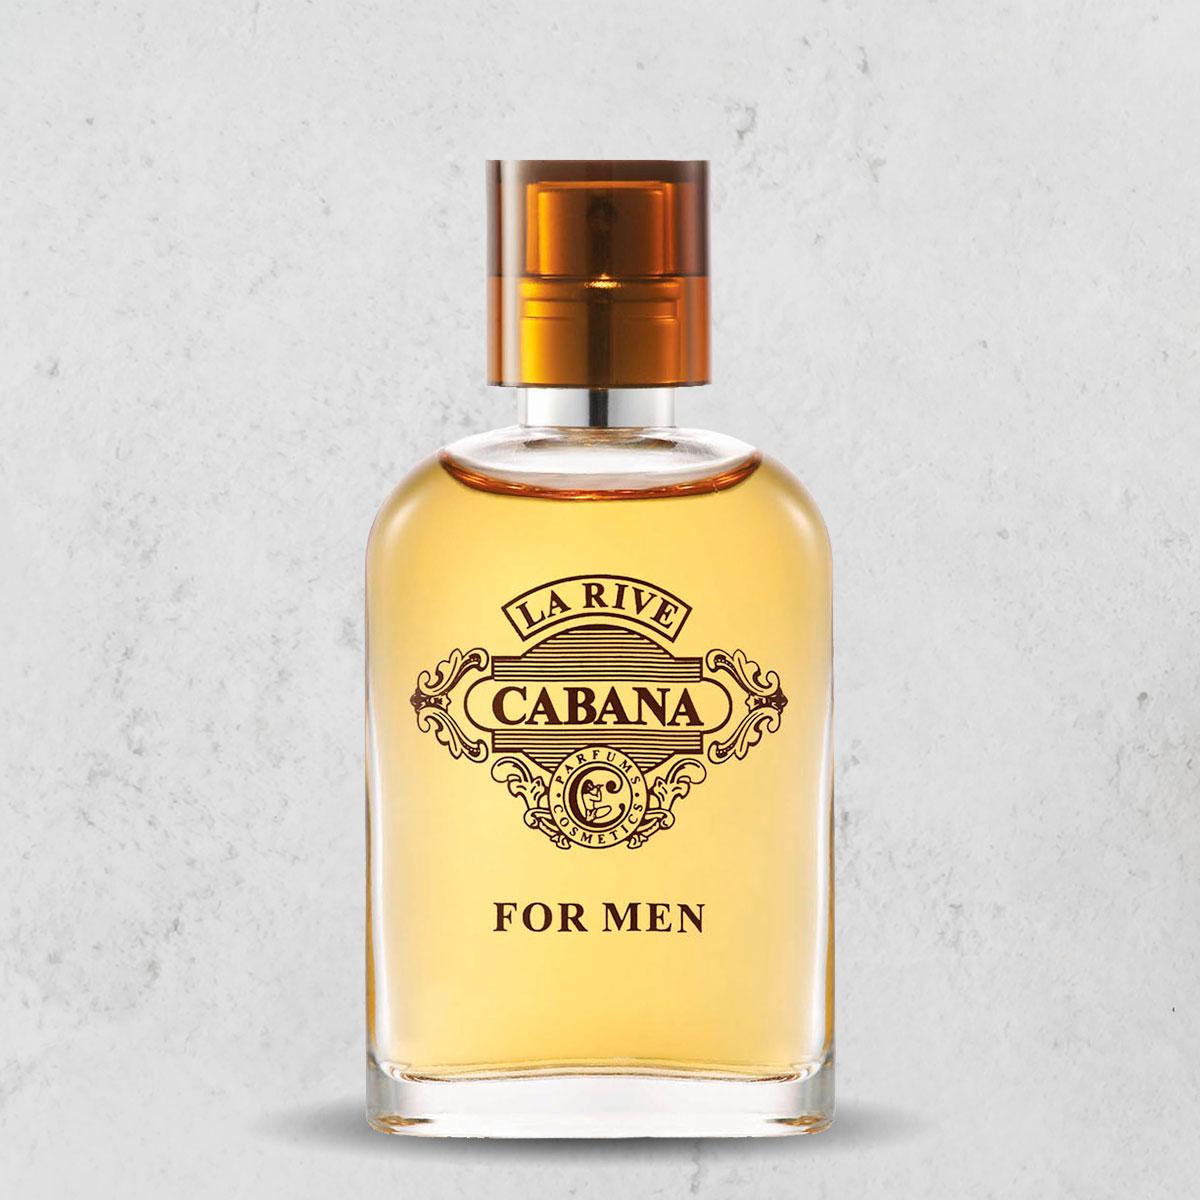 Perfume Cabana edt Masculino 30ml La Rive